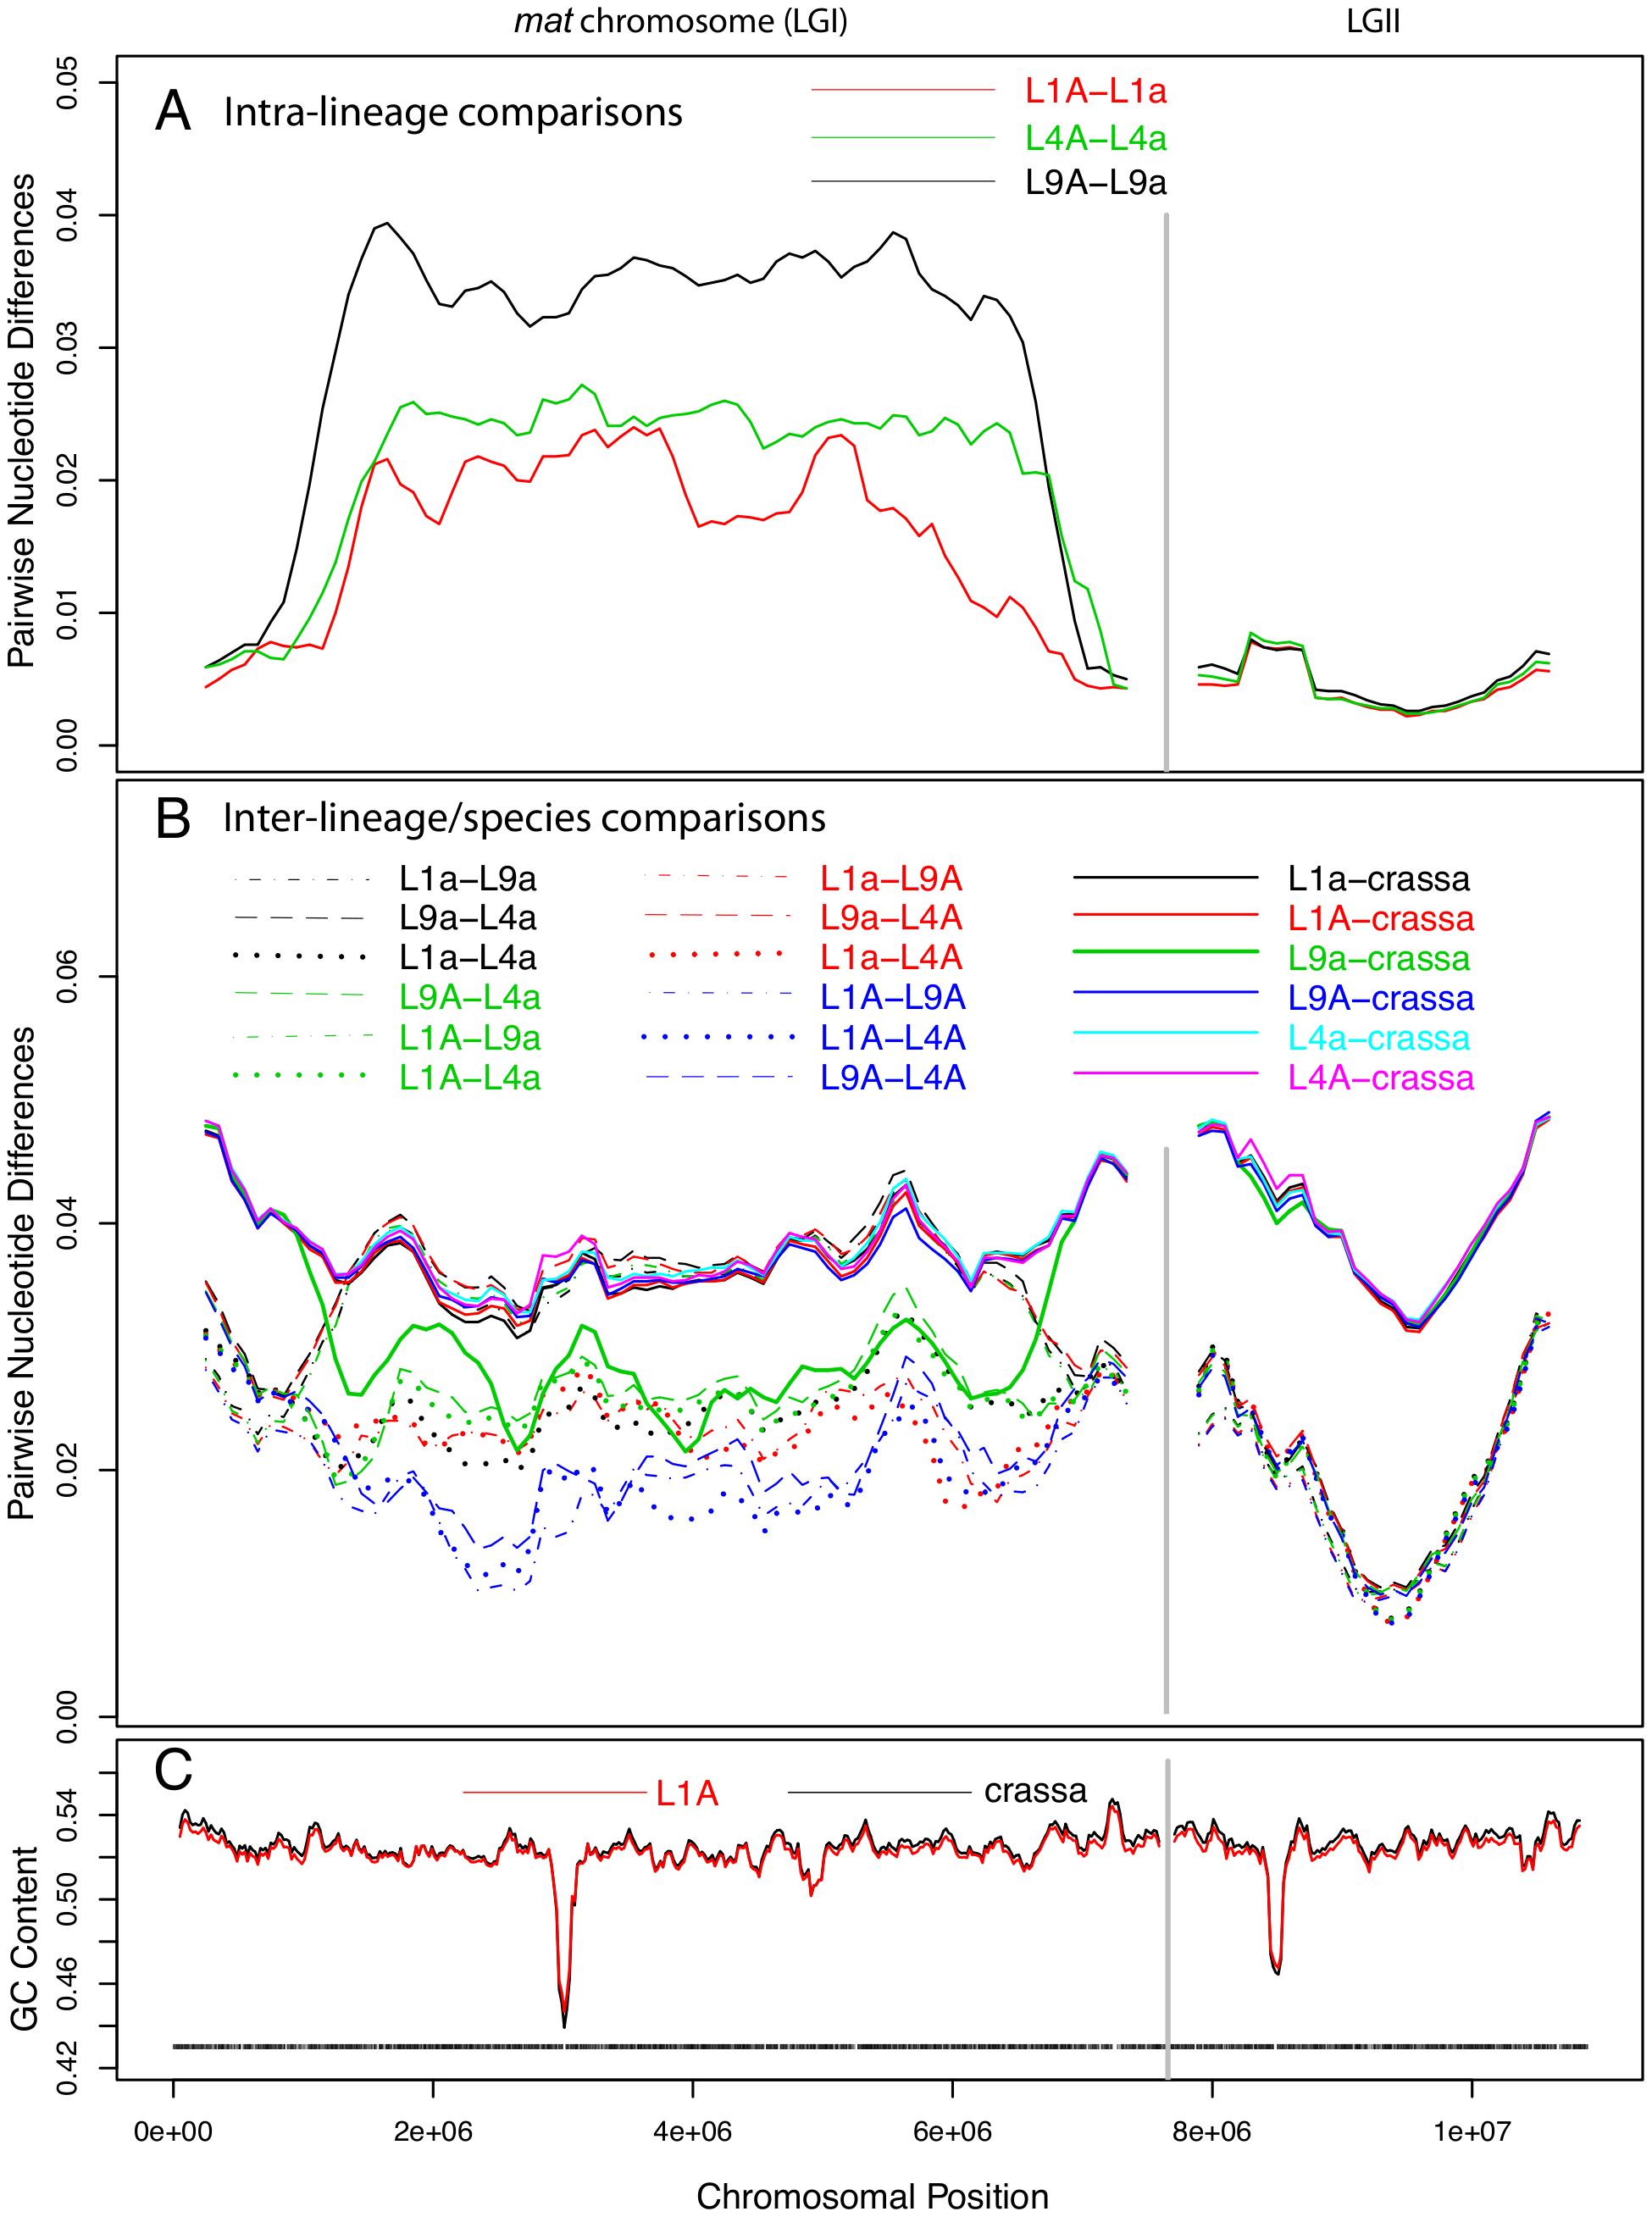 Pair-wise divergences of the mating-type (<i>mat</i>) chromosomes and one selected autosome of <i>Neurospora tetrasperma</i> lineages and <i>Neurospora crassa</i>.